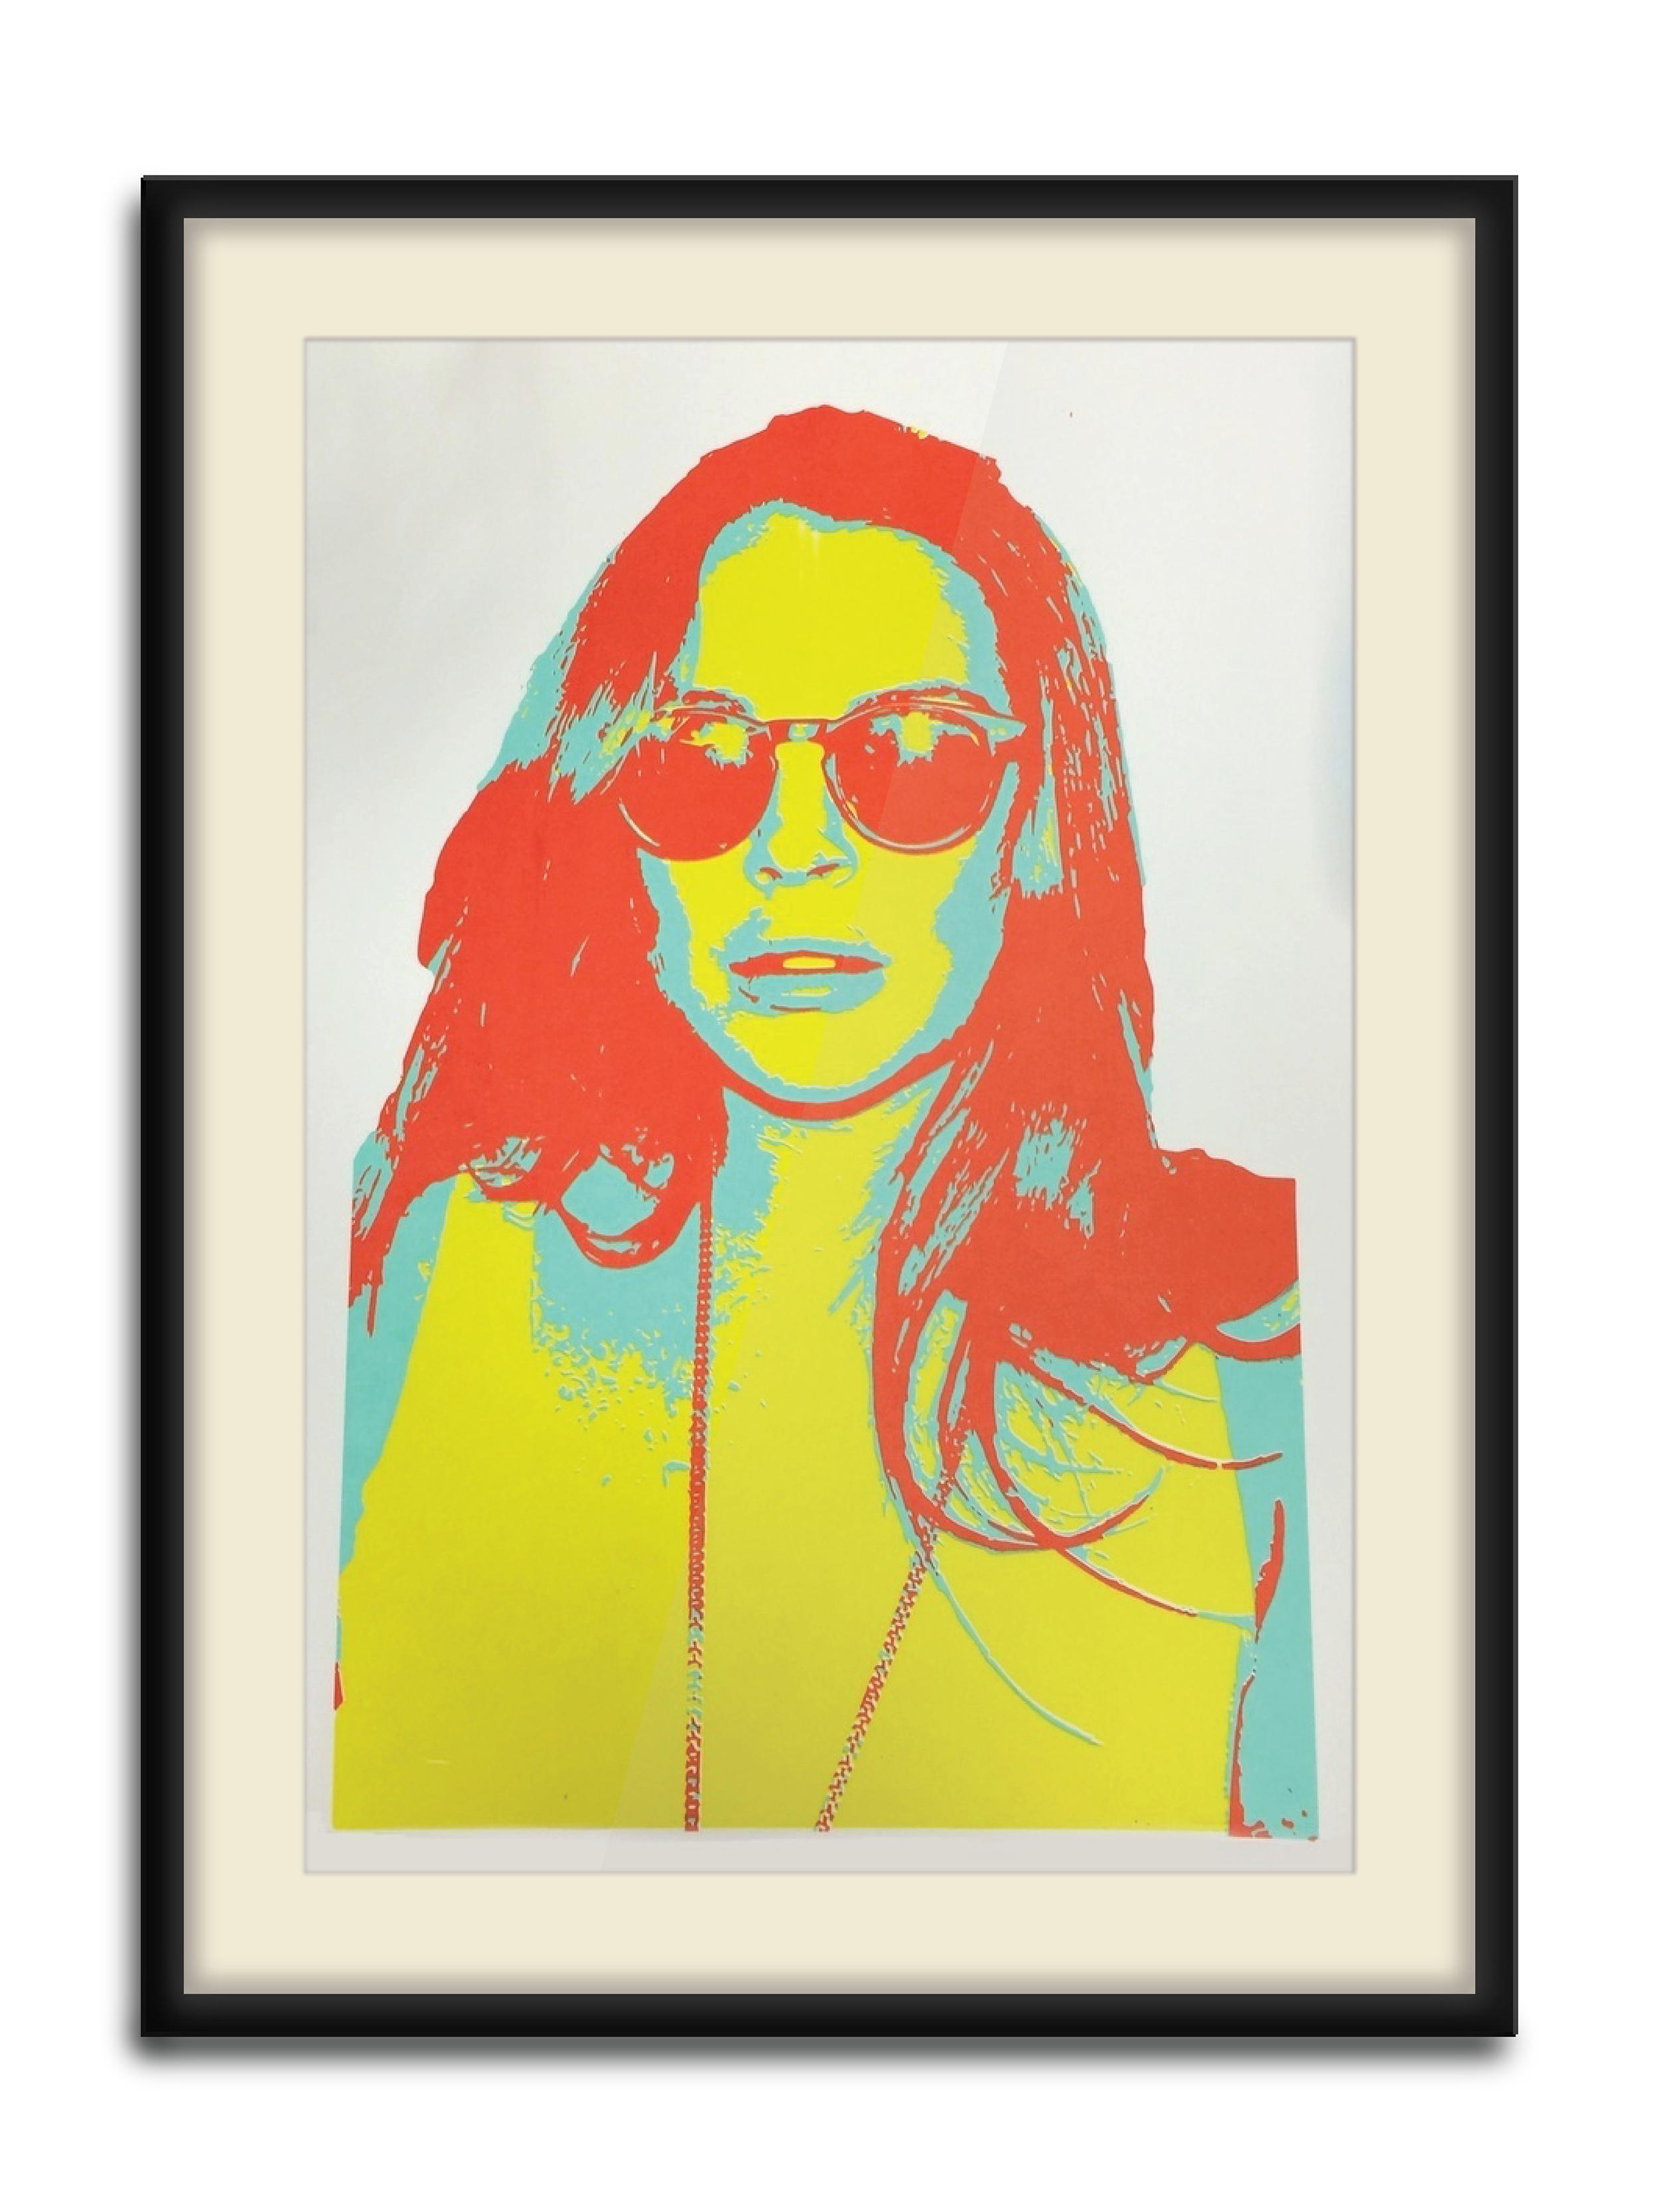 """ La Loca Lohan II""  3 Color Hand Pulled Screen Print  Print Size : 11"" x 17""  1 of 10"